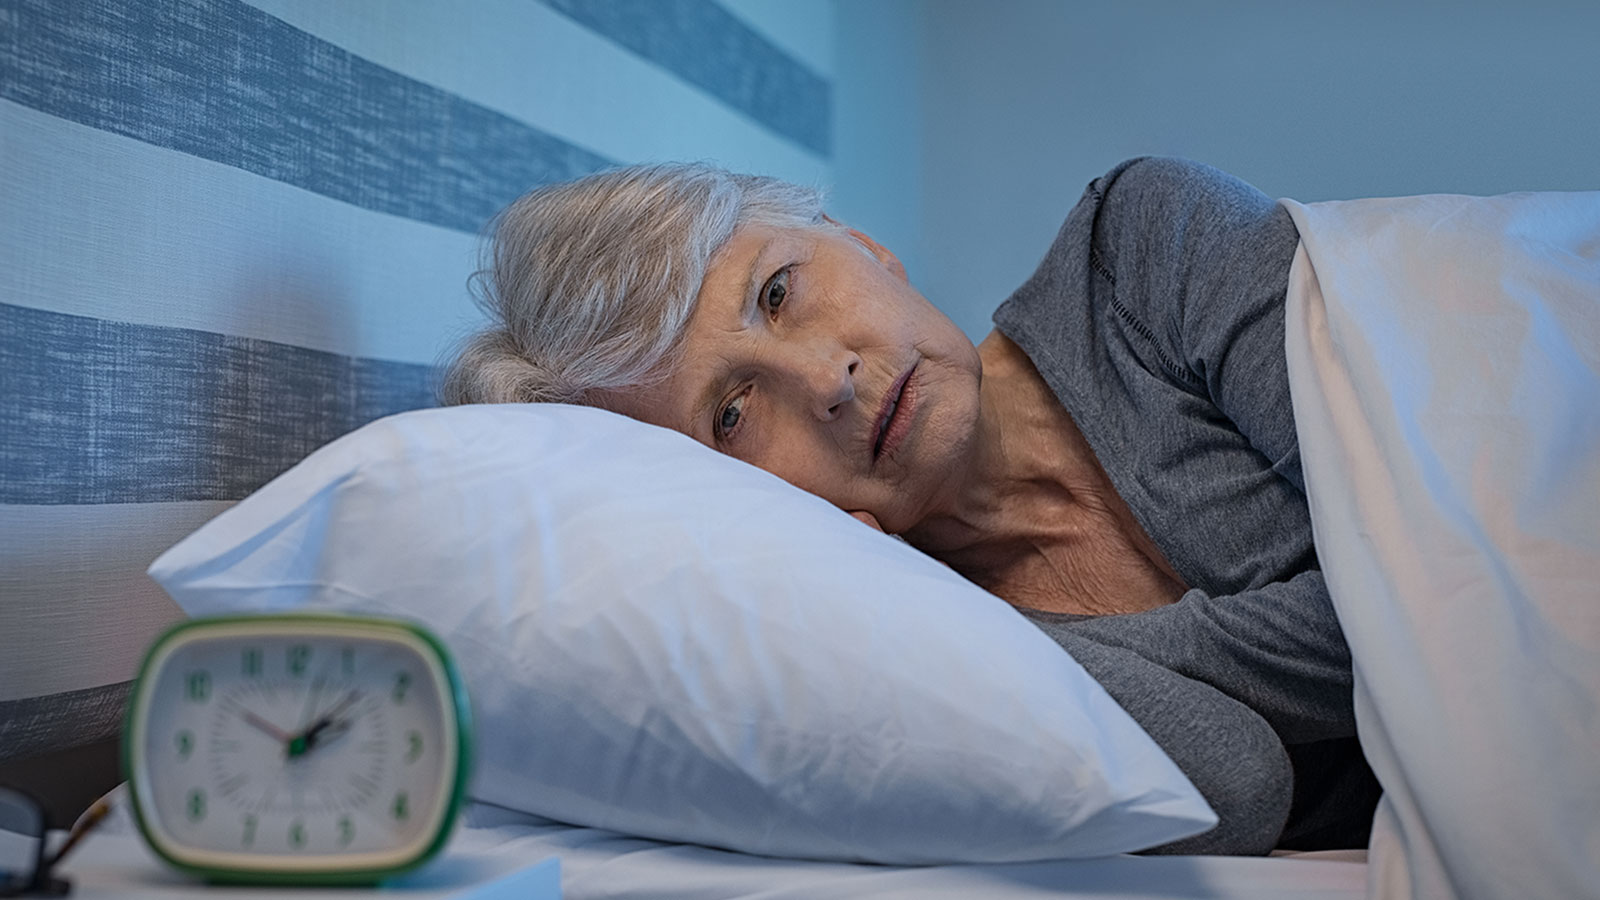 Dormir mal podría ser una señal temprana de Alzheimer